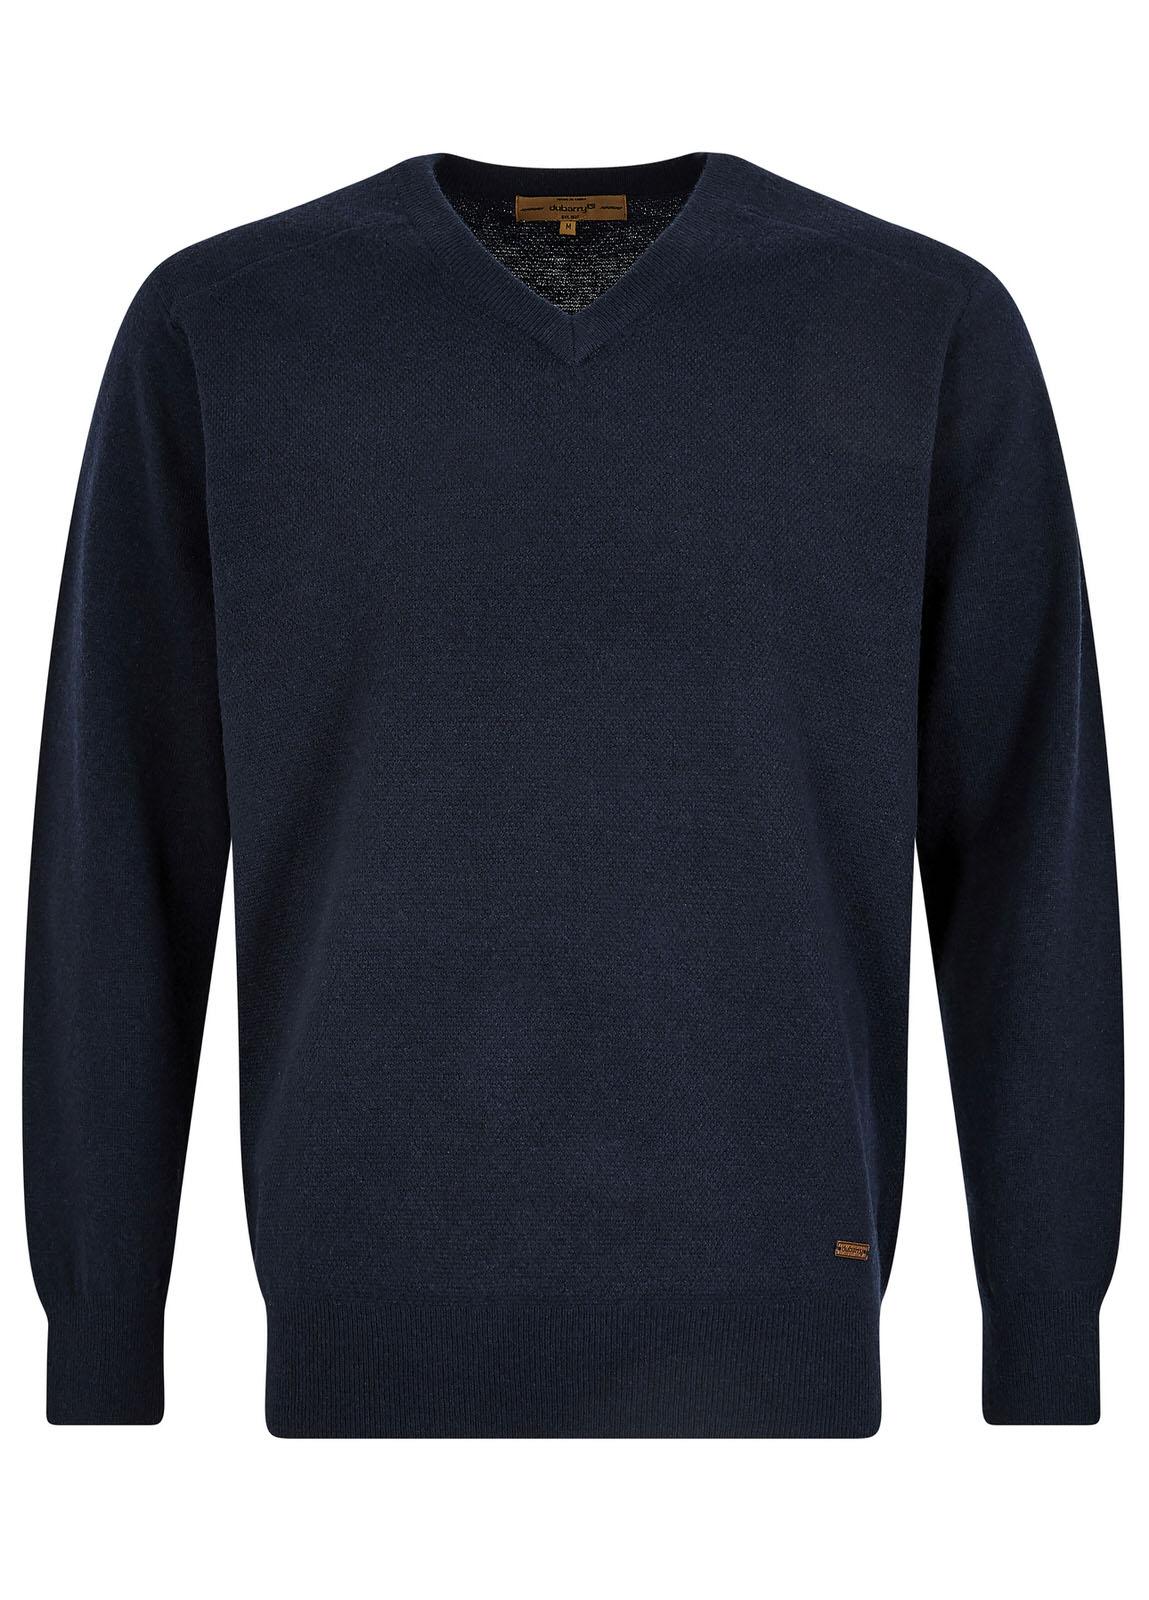 Lynch_Sweater_Navy_Image_1